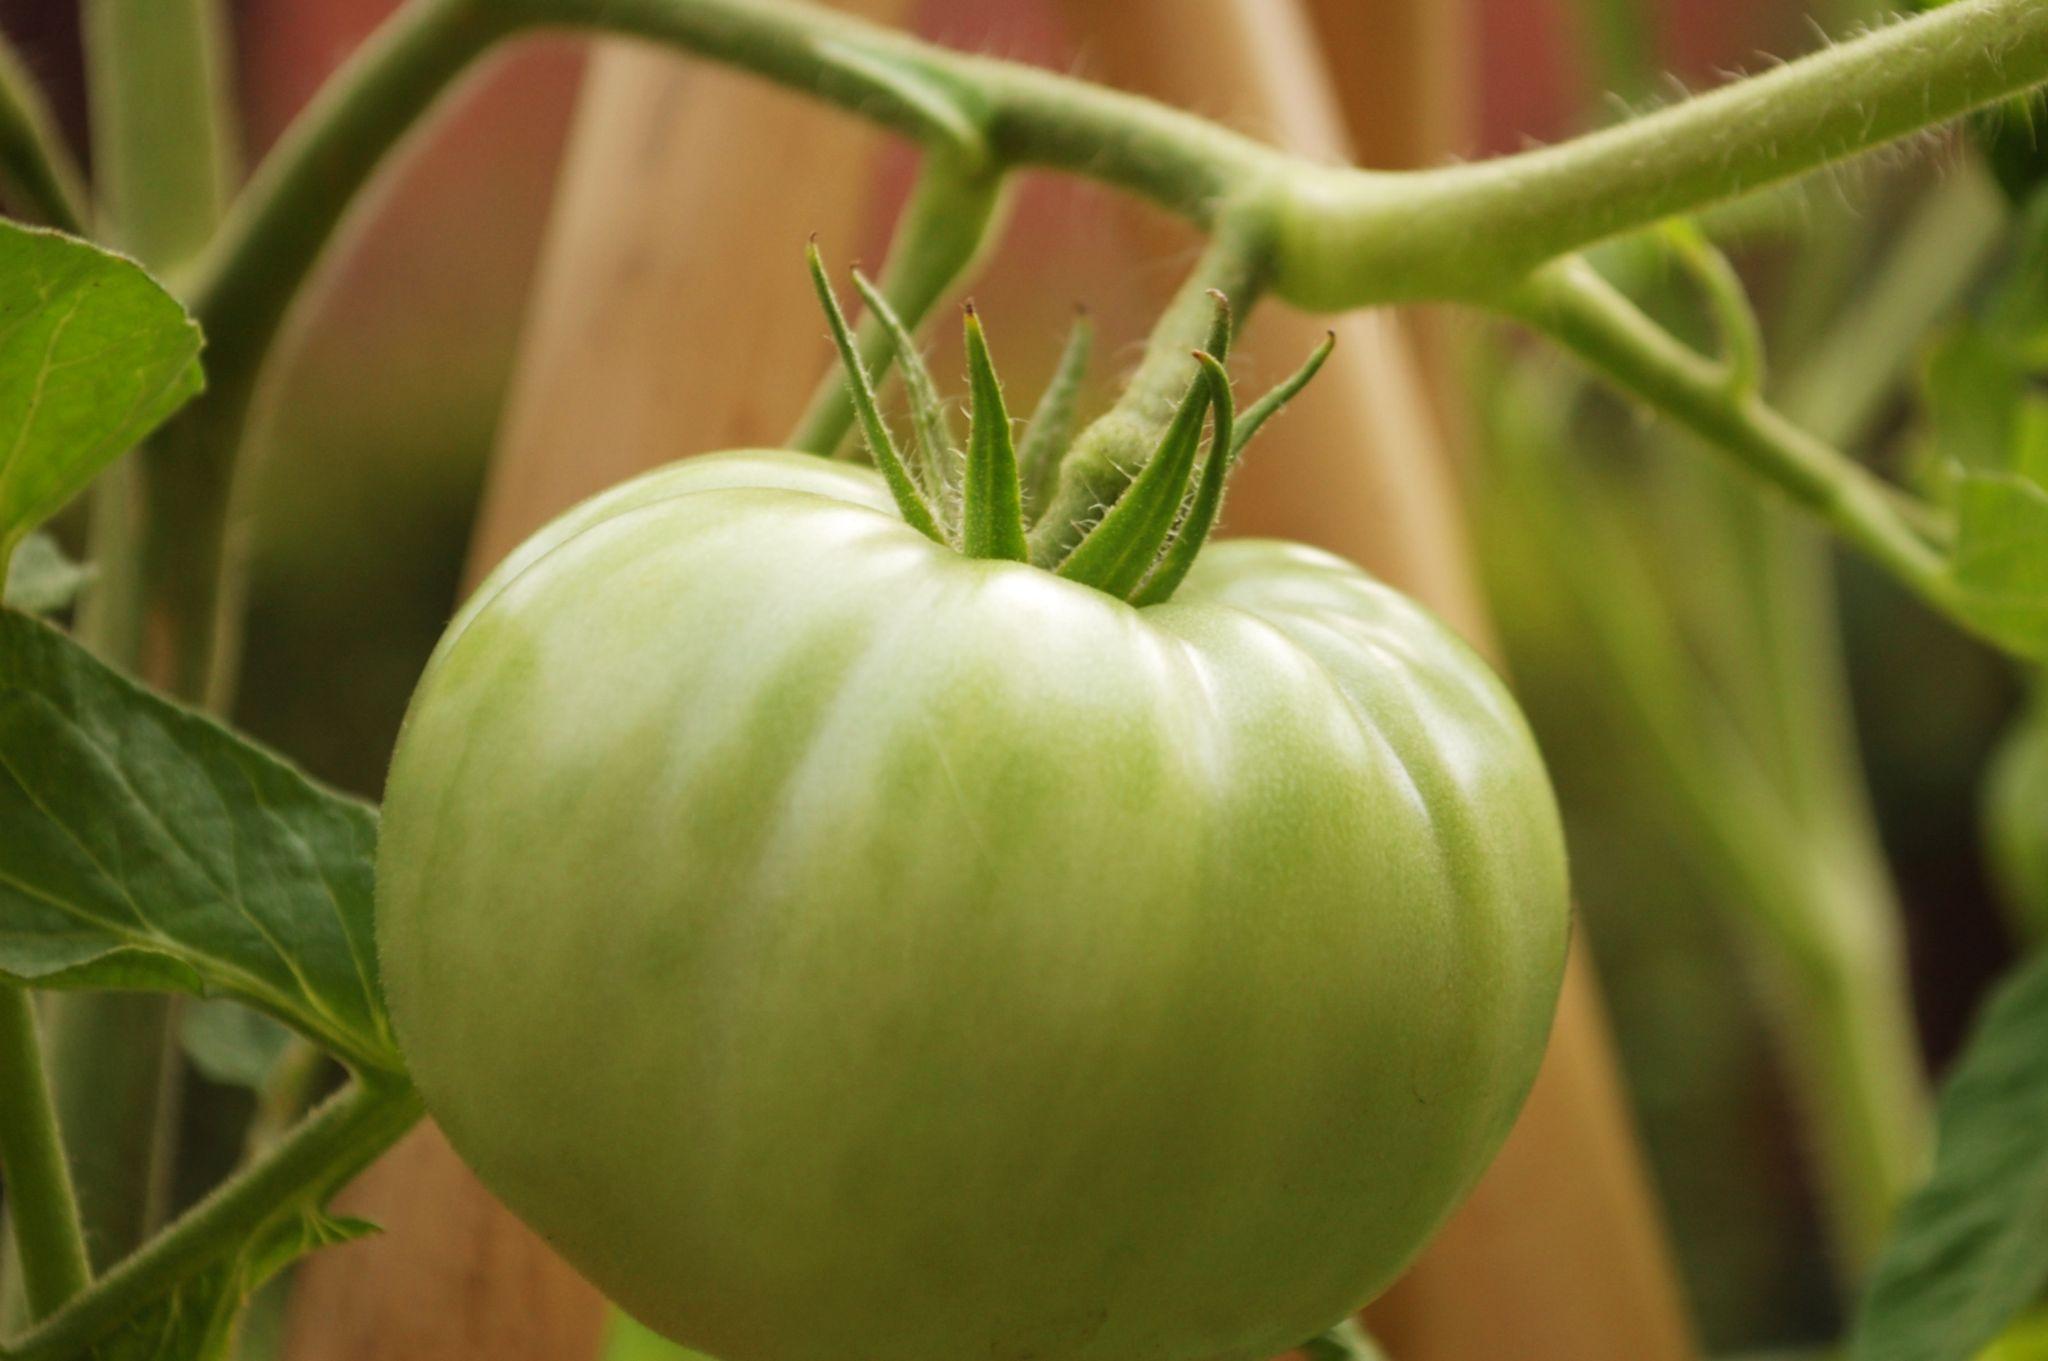 Ah...huge green tomato by Yoko D